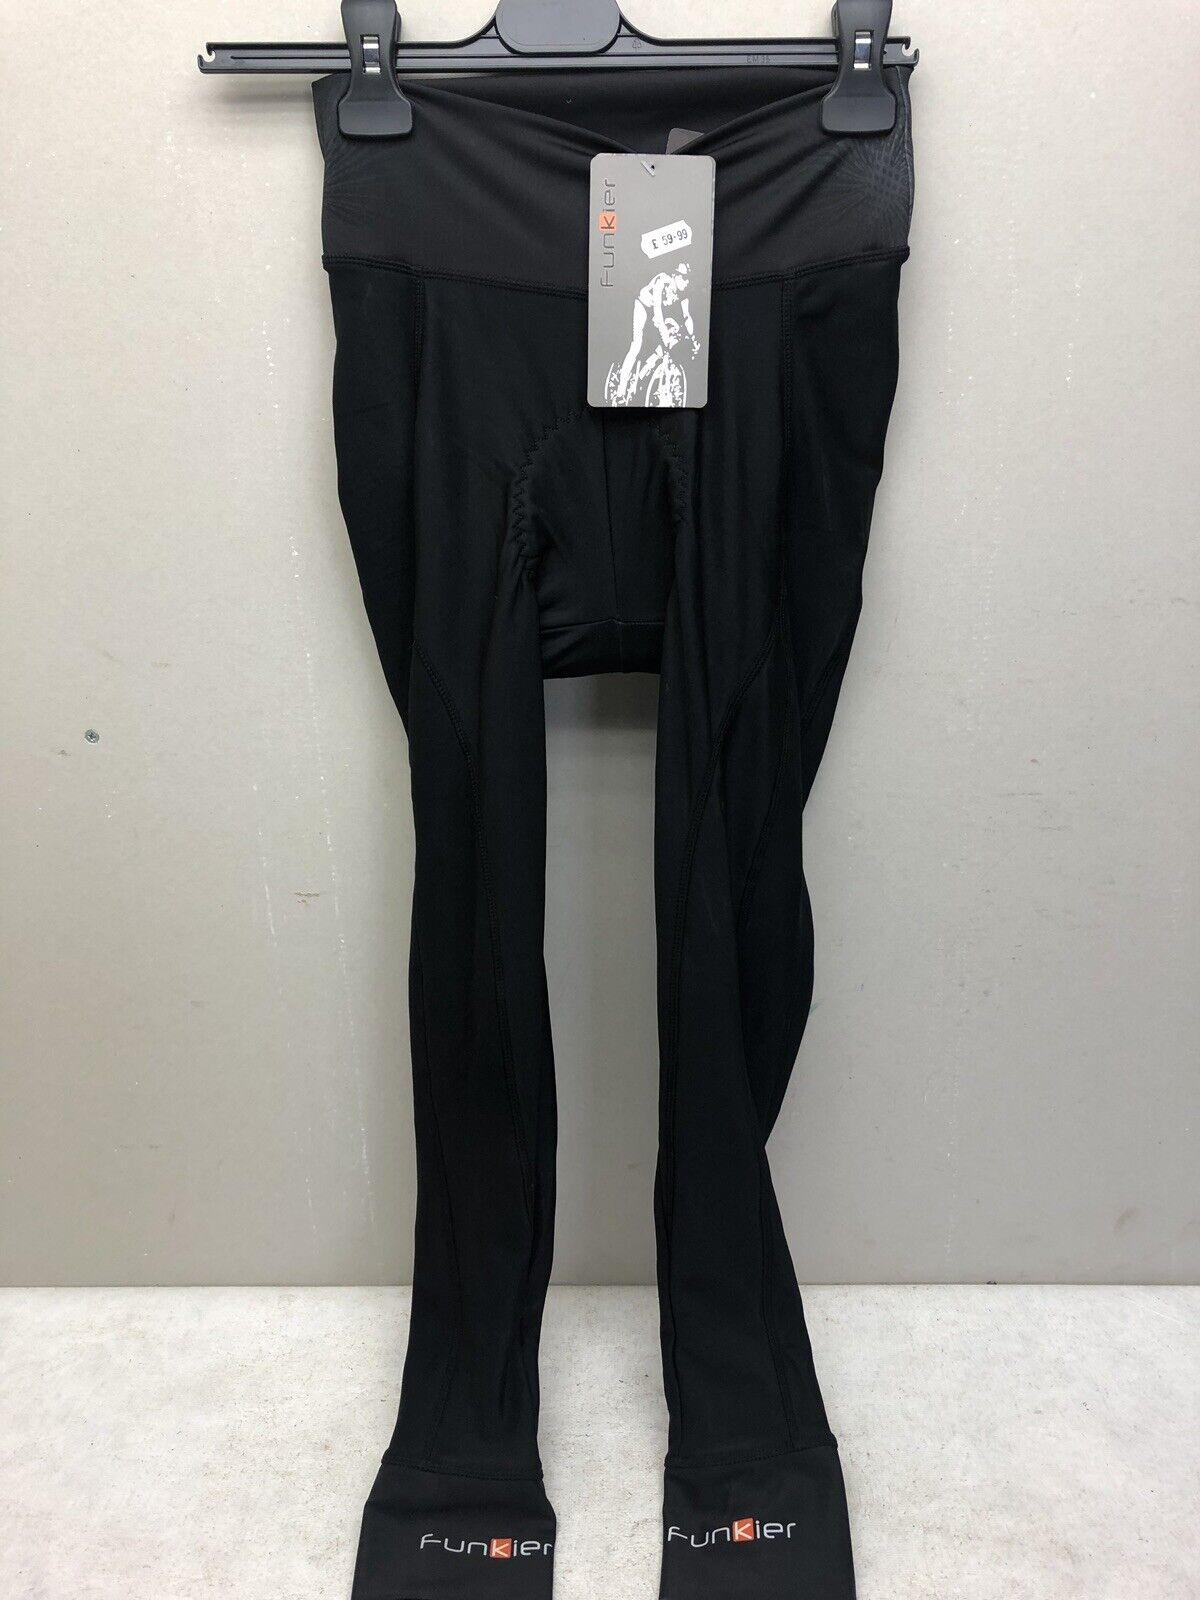 Funkier Polesse Ladies Calzas térmica activa en negro (S-138-W-B13) Talla XL